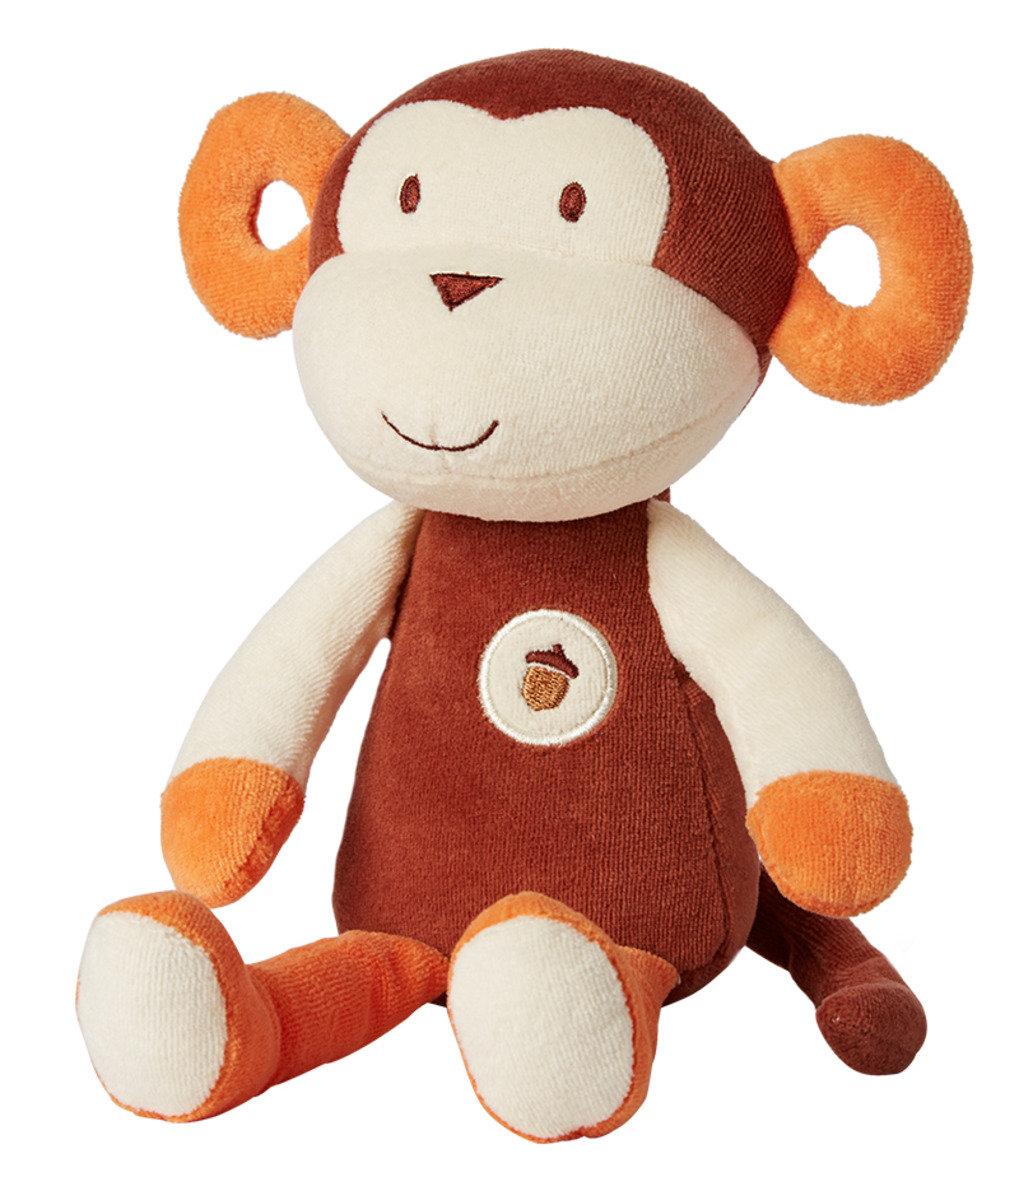 Plush Collection天然有機棉公仔 - 棕色小猴